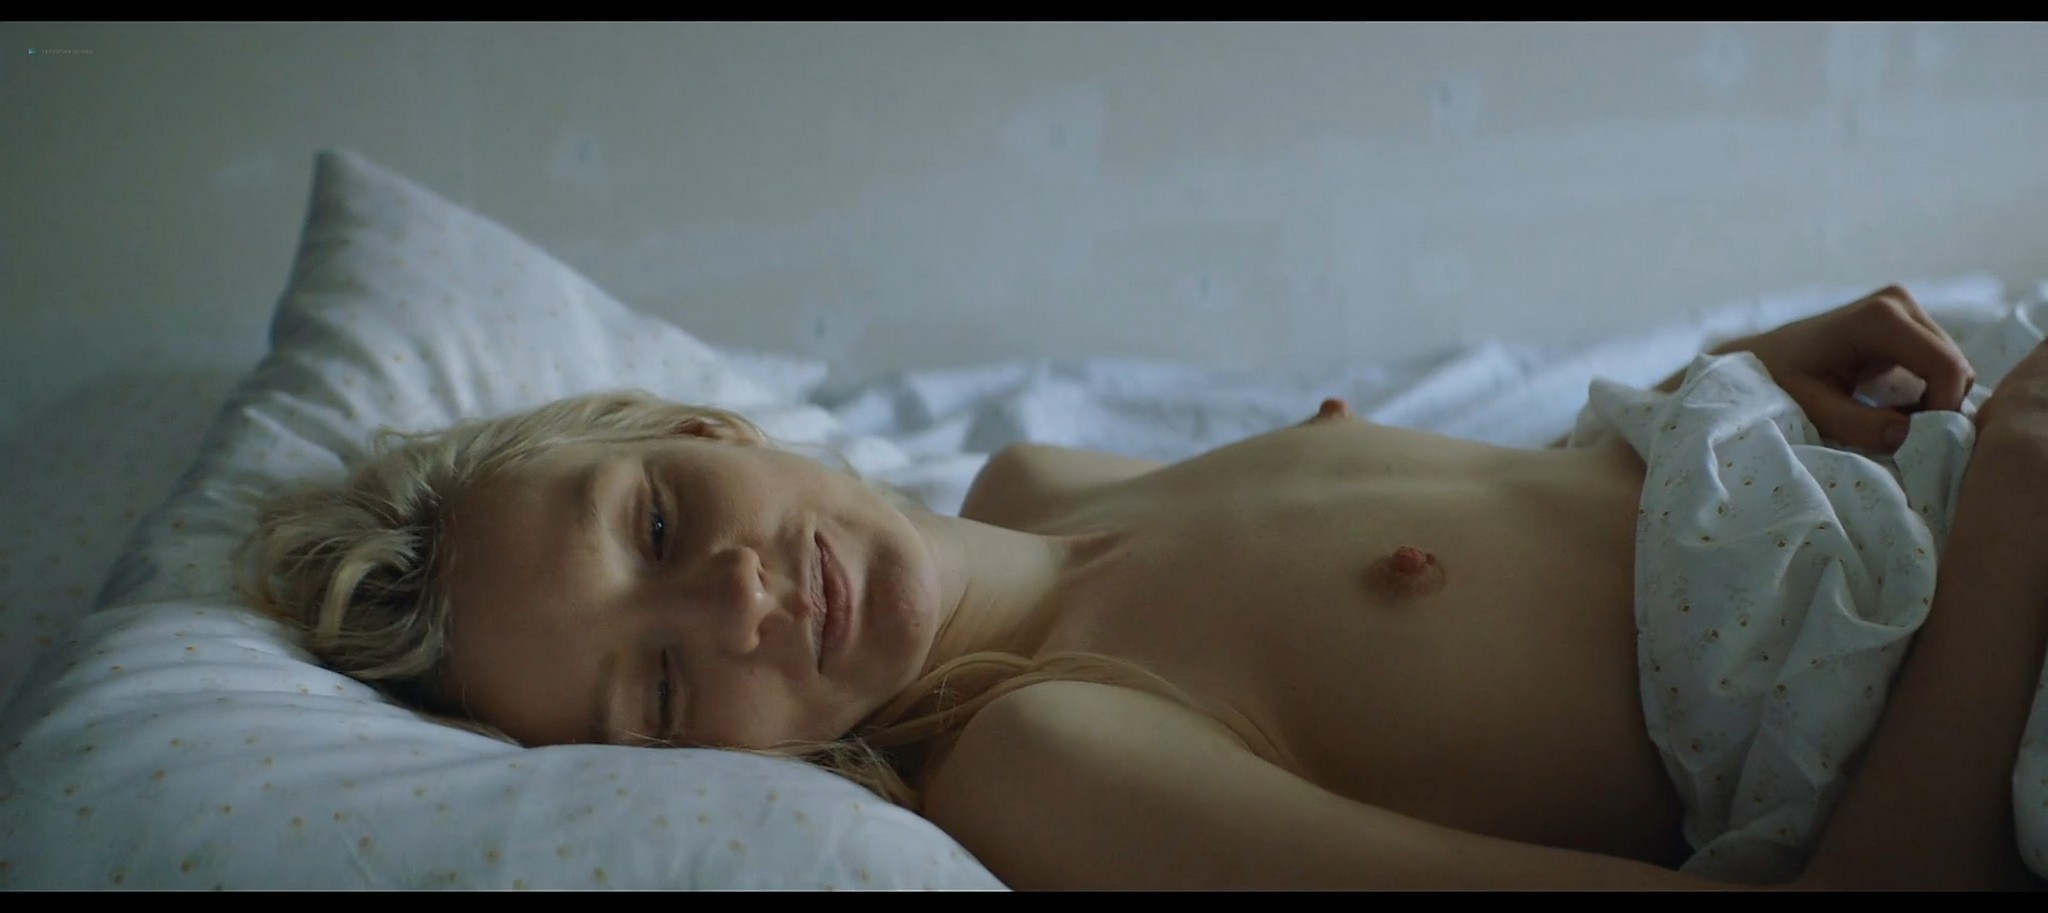 Lena Tronina nude and hot sex Happy End RU 2021 S1e3 4 1080p Web 10